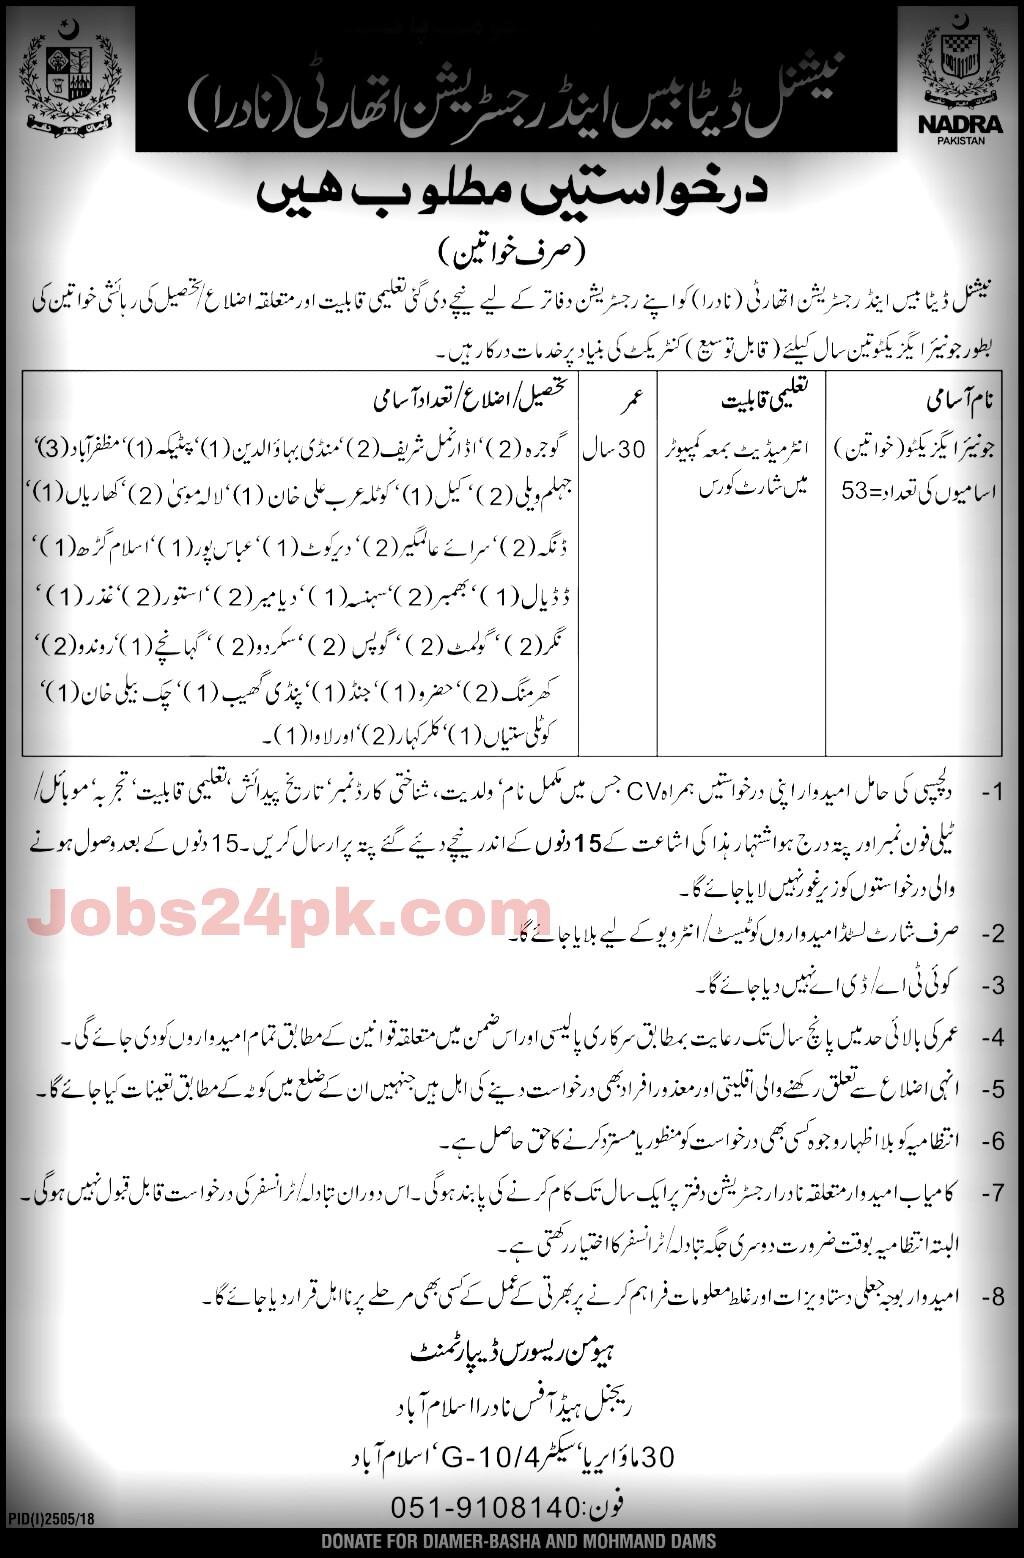 NADRA Jobs For All Pakistan Of junior Executives Females